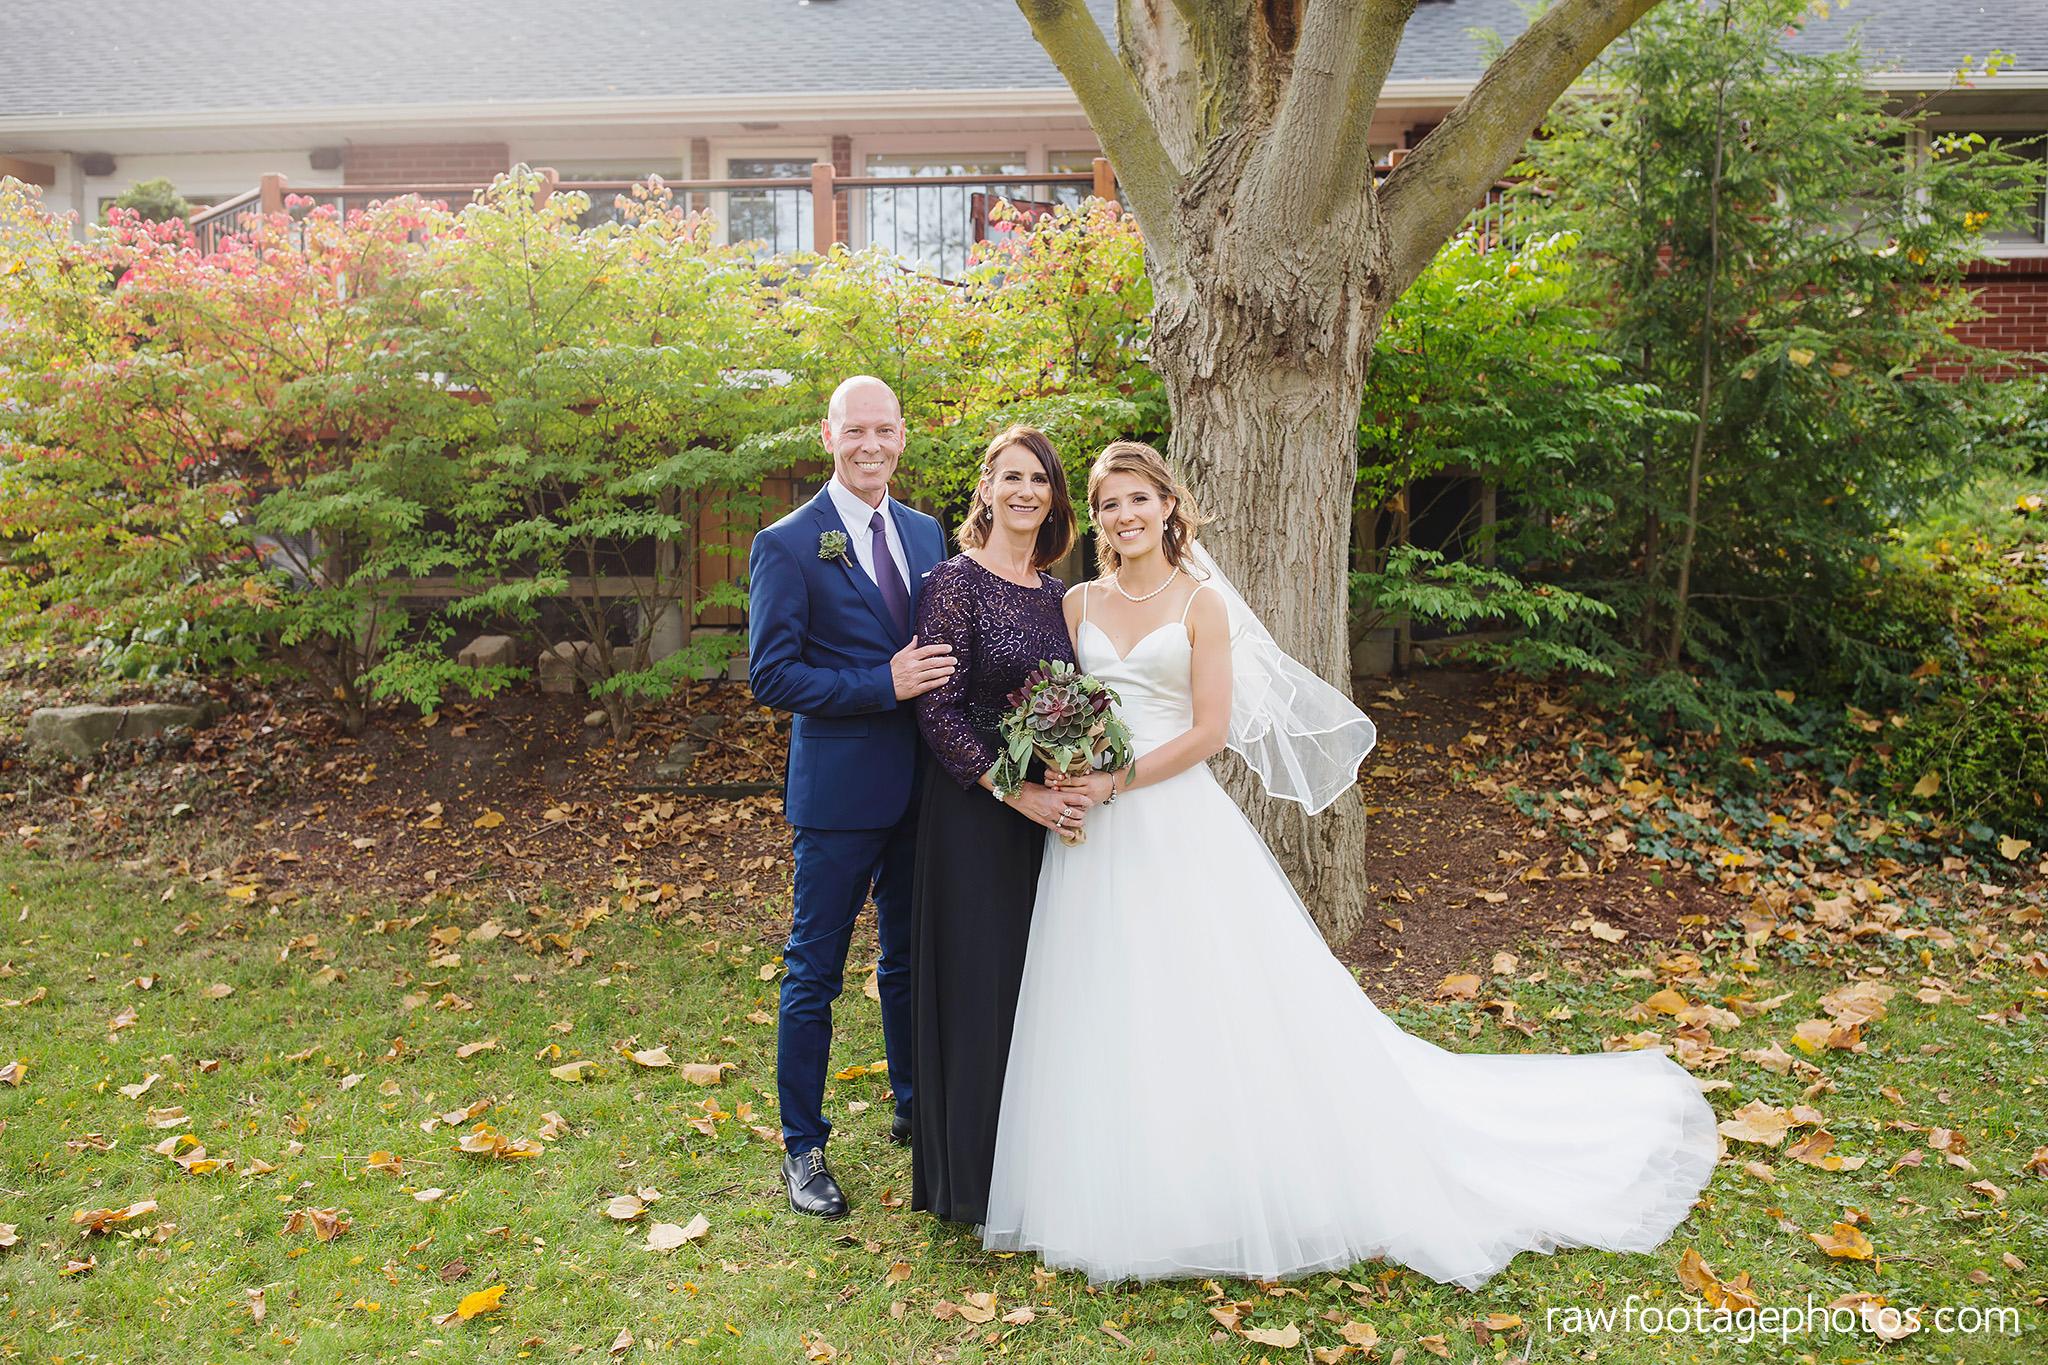 london_ontario_wedding_photographer-civic_gardens-springbank_park-succulent_bouquet-fall_wedding-bridge-raw_footage_photography017.jpg